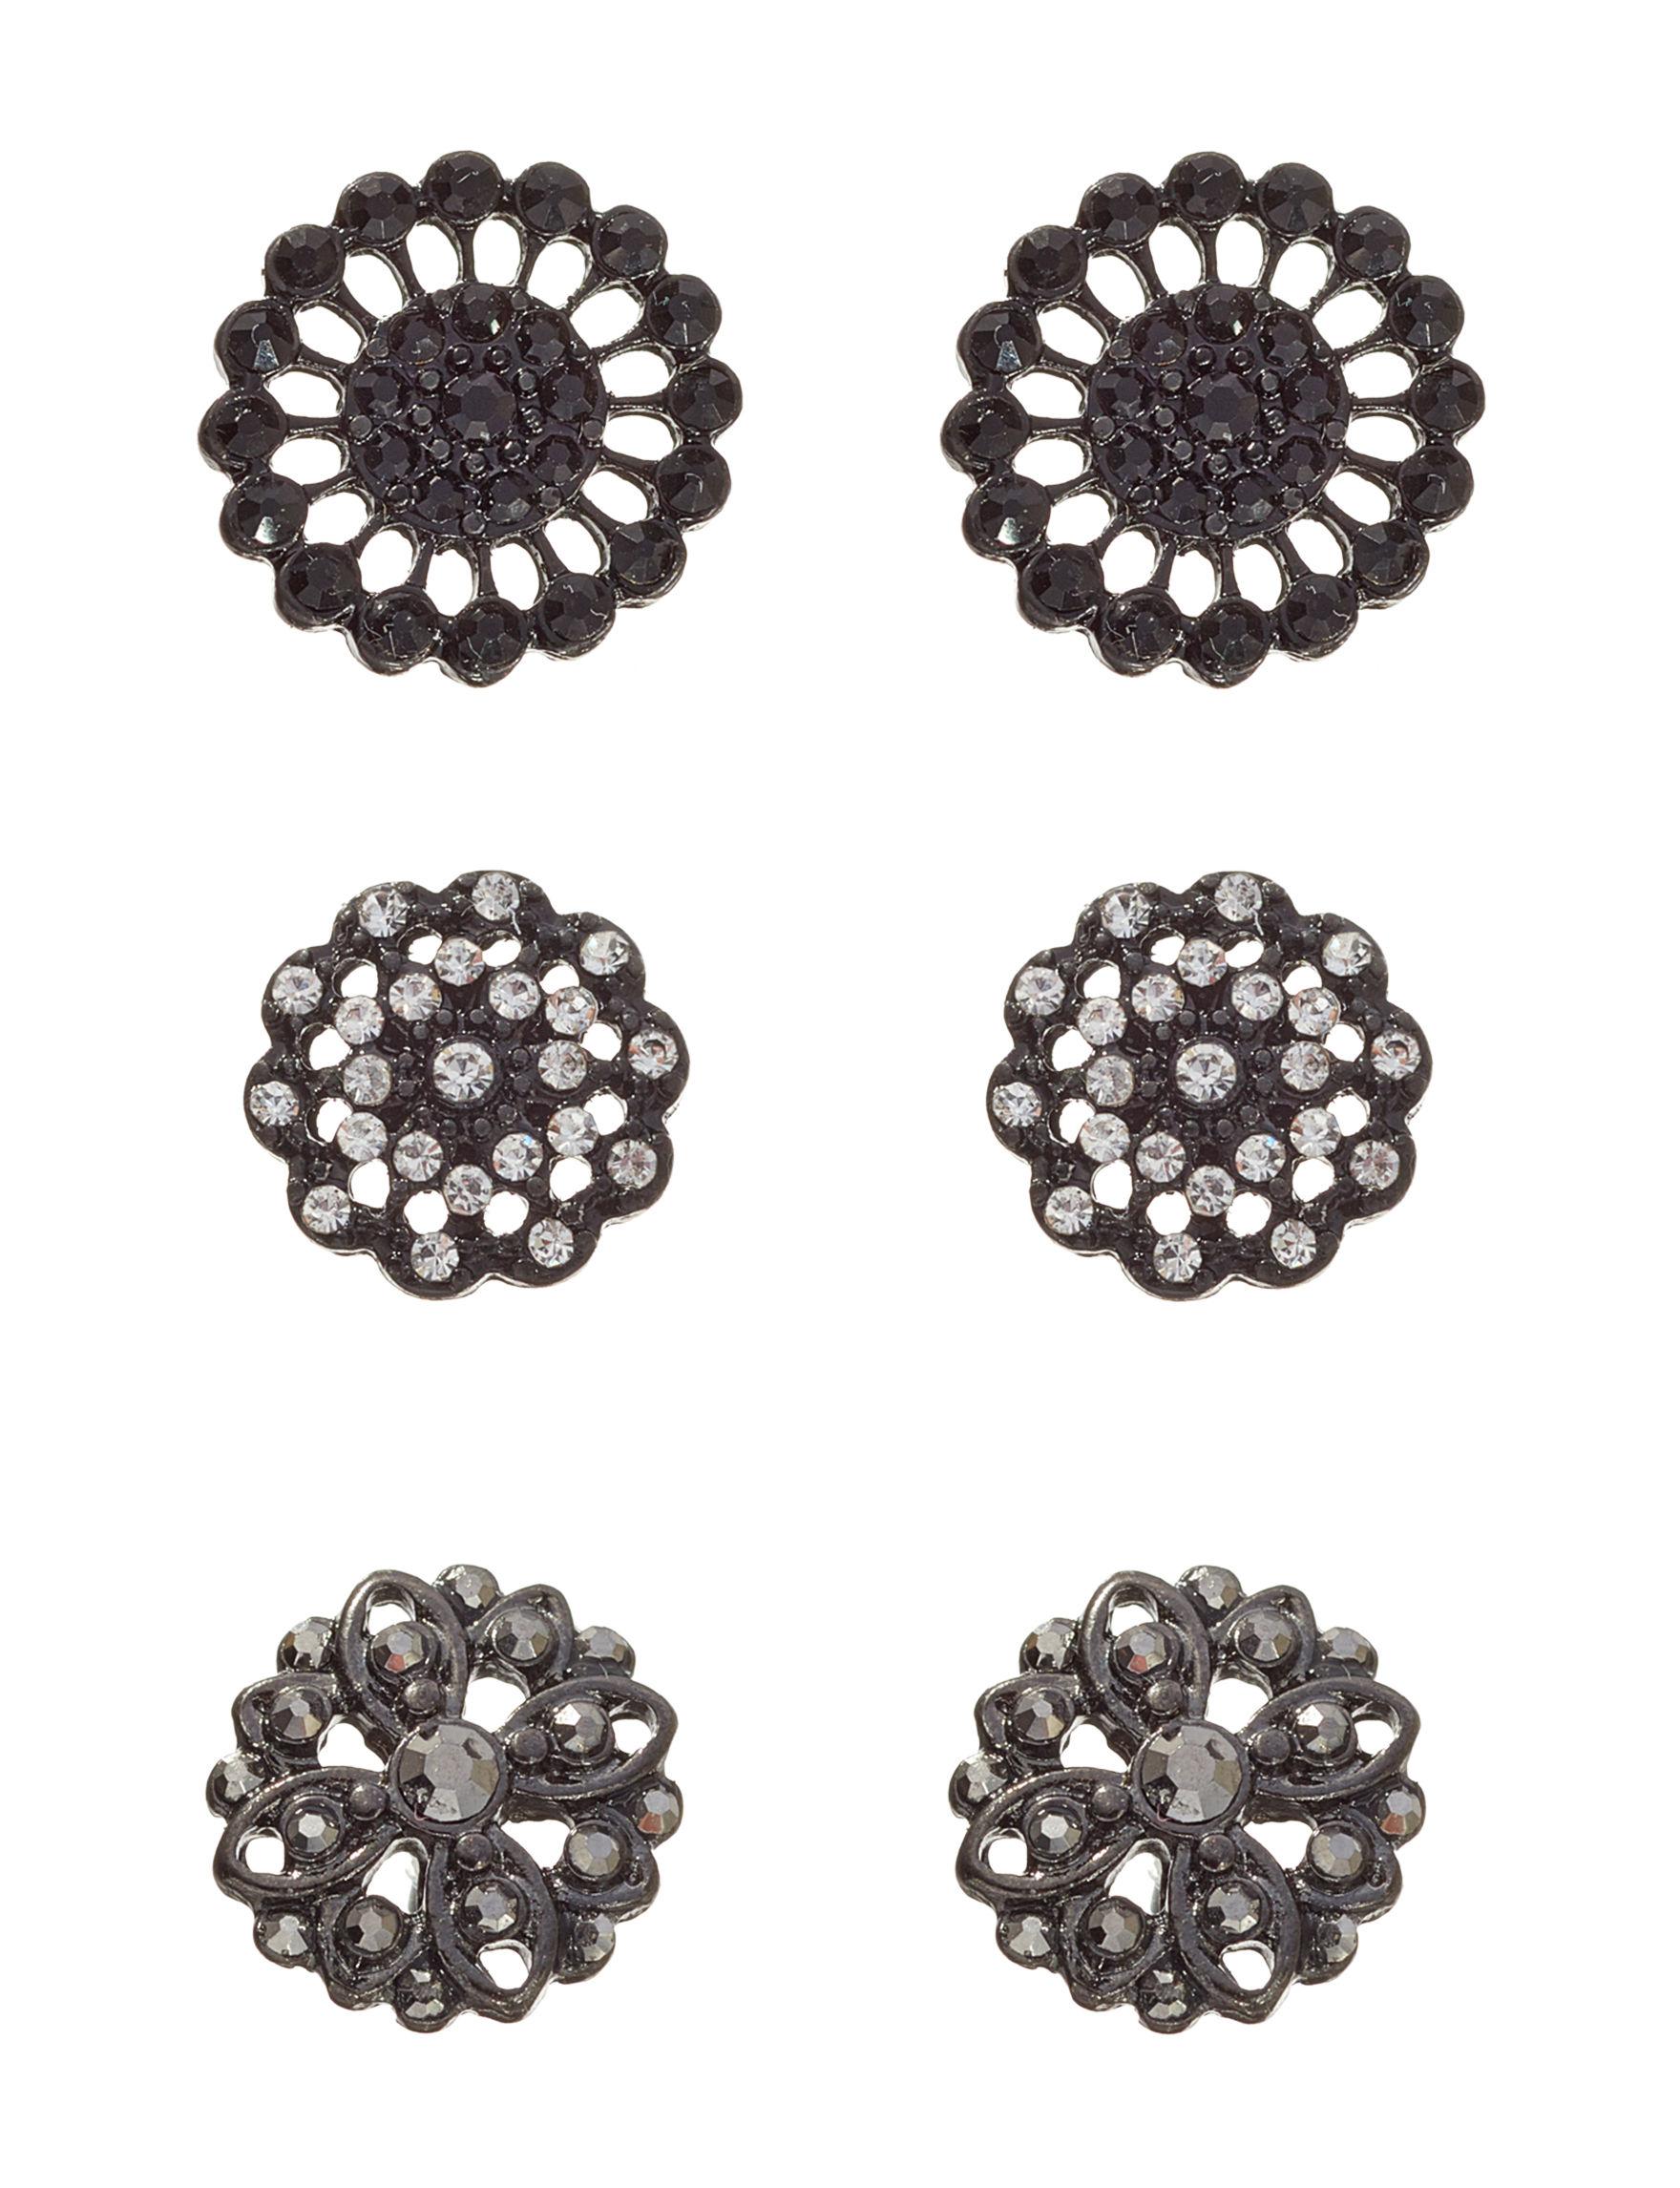 Hannah Black Crystal Studs Earrings Fashion Jewelry